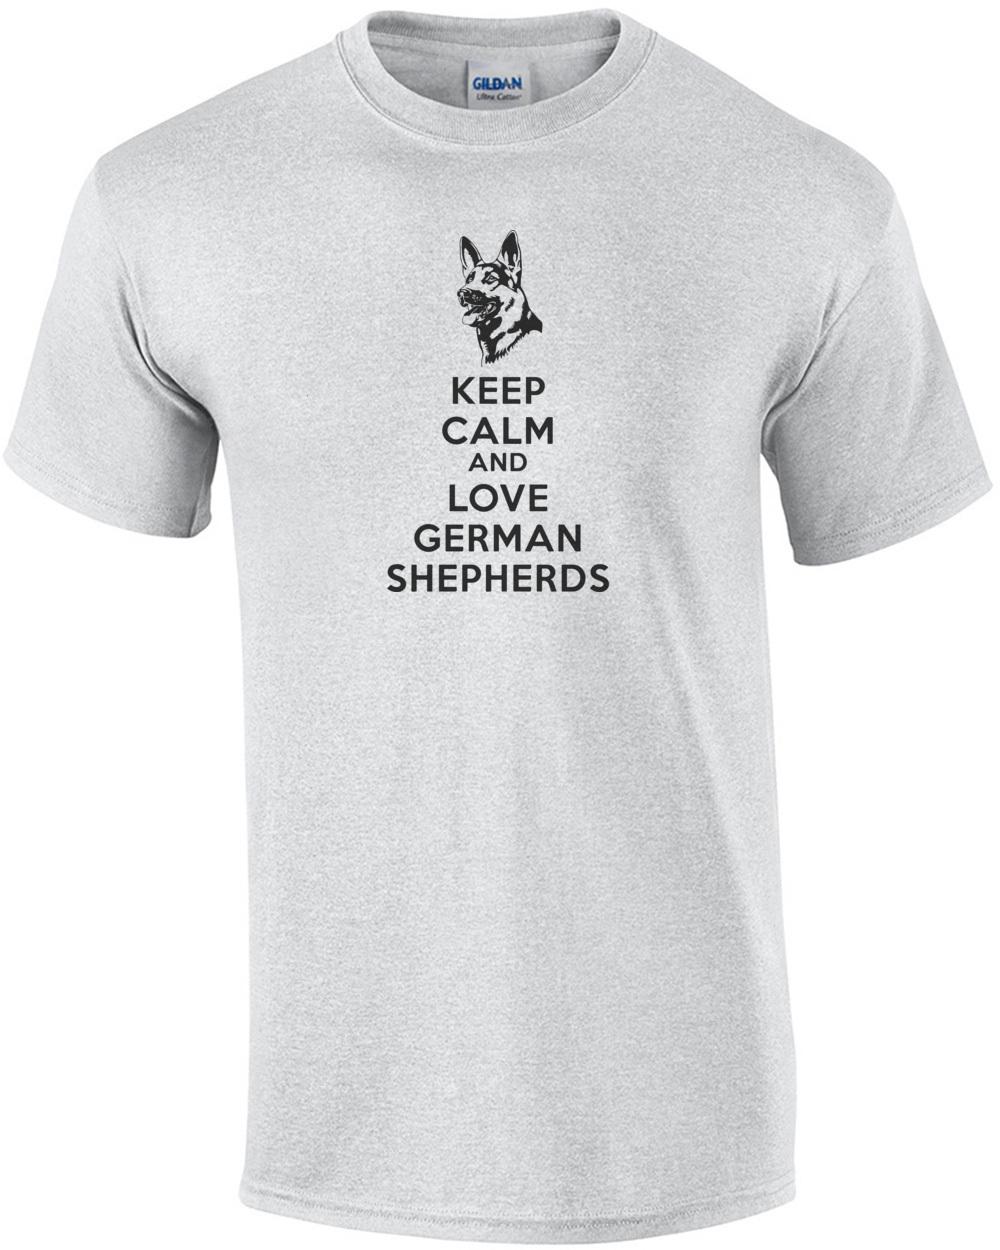 Keep Calm /& Walk German Shepherd Dog Lover Funny Ladies T Shirt